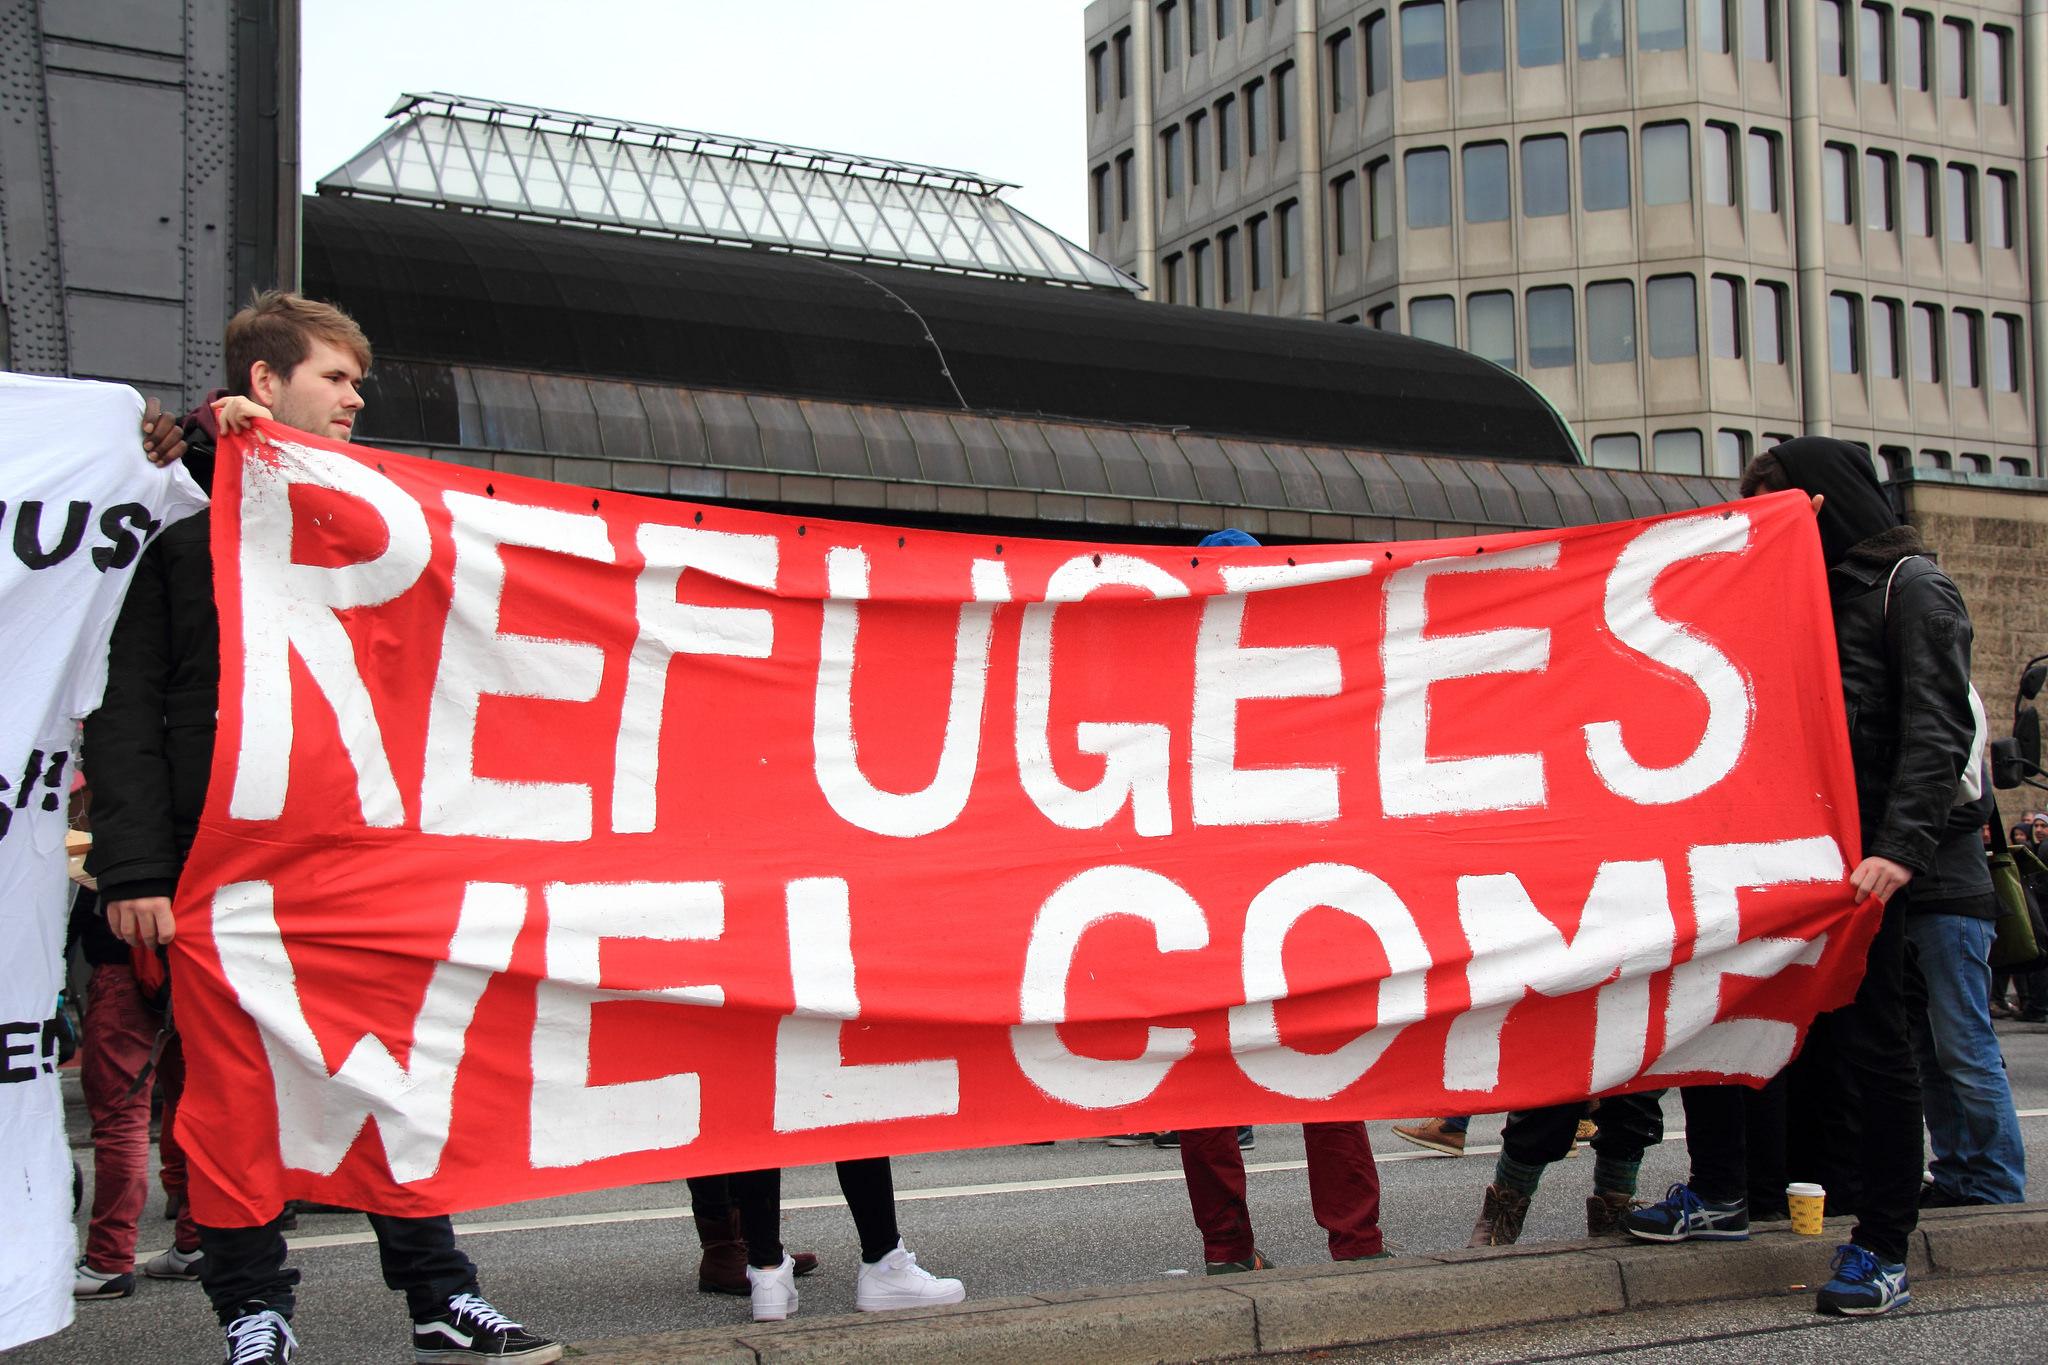 A demonstration on Nov. 14, 2015, in support of refugees in Hamburg, Germany. Credit:  Rasande Tyskar / Flickr